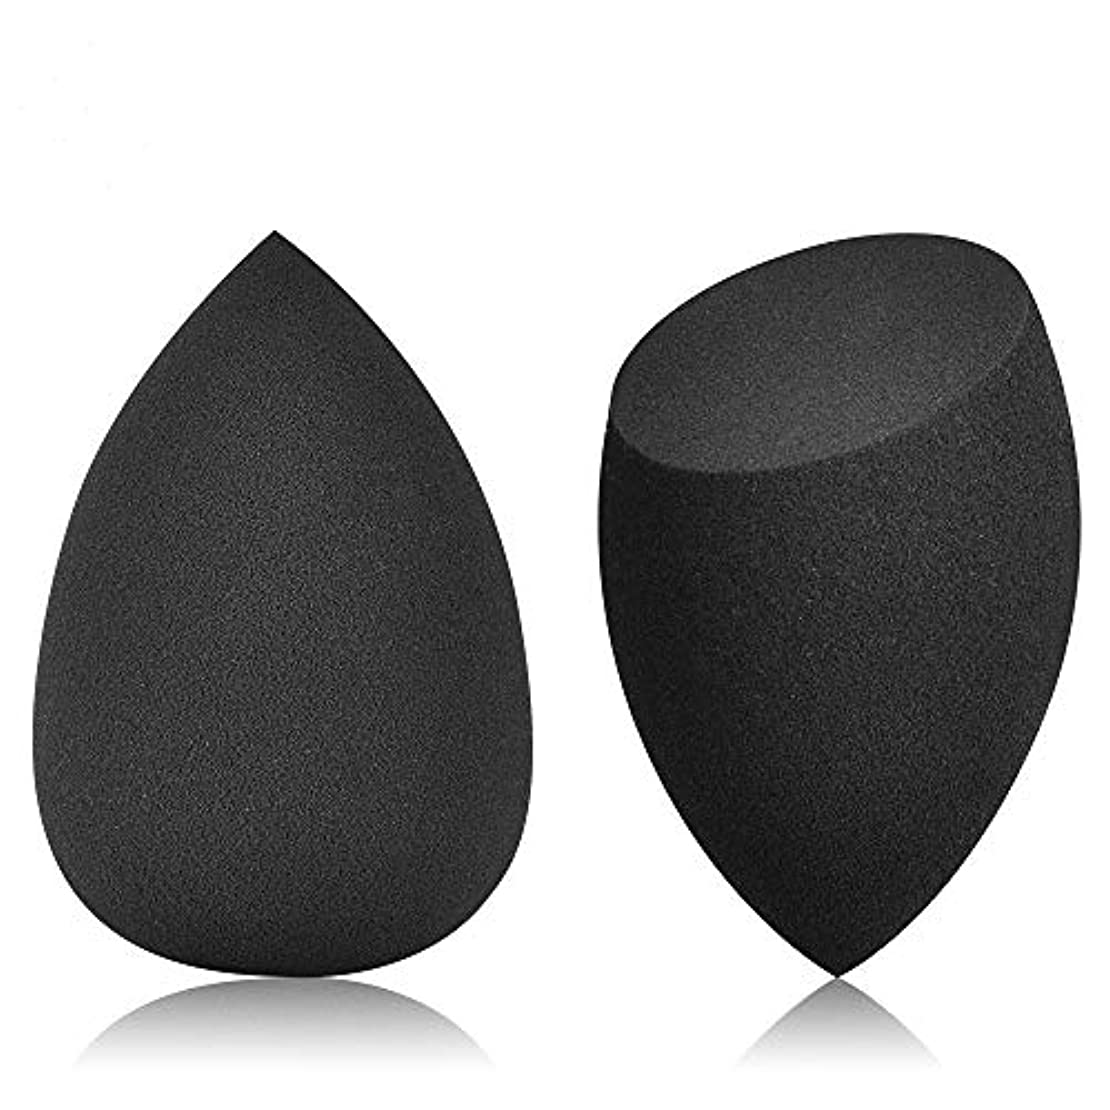 (JOLIK)メイクスポンジ 化粧用 多機能パフ 乾湿兼用 親水 涙型&ドロップ切断型 2個セット収納ボックス付き ブラック